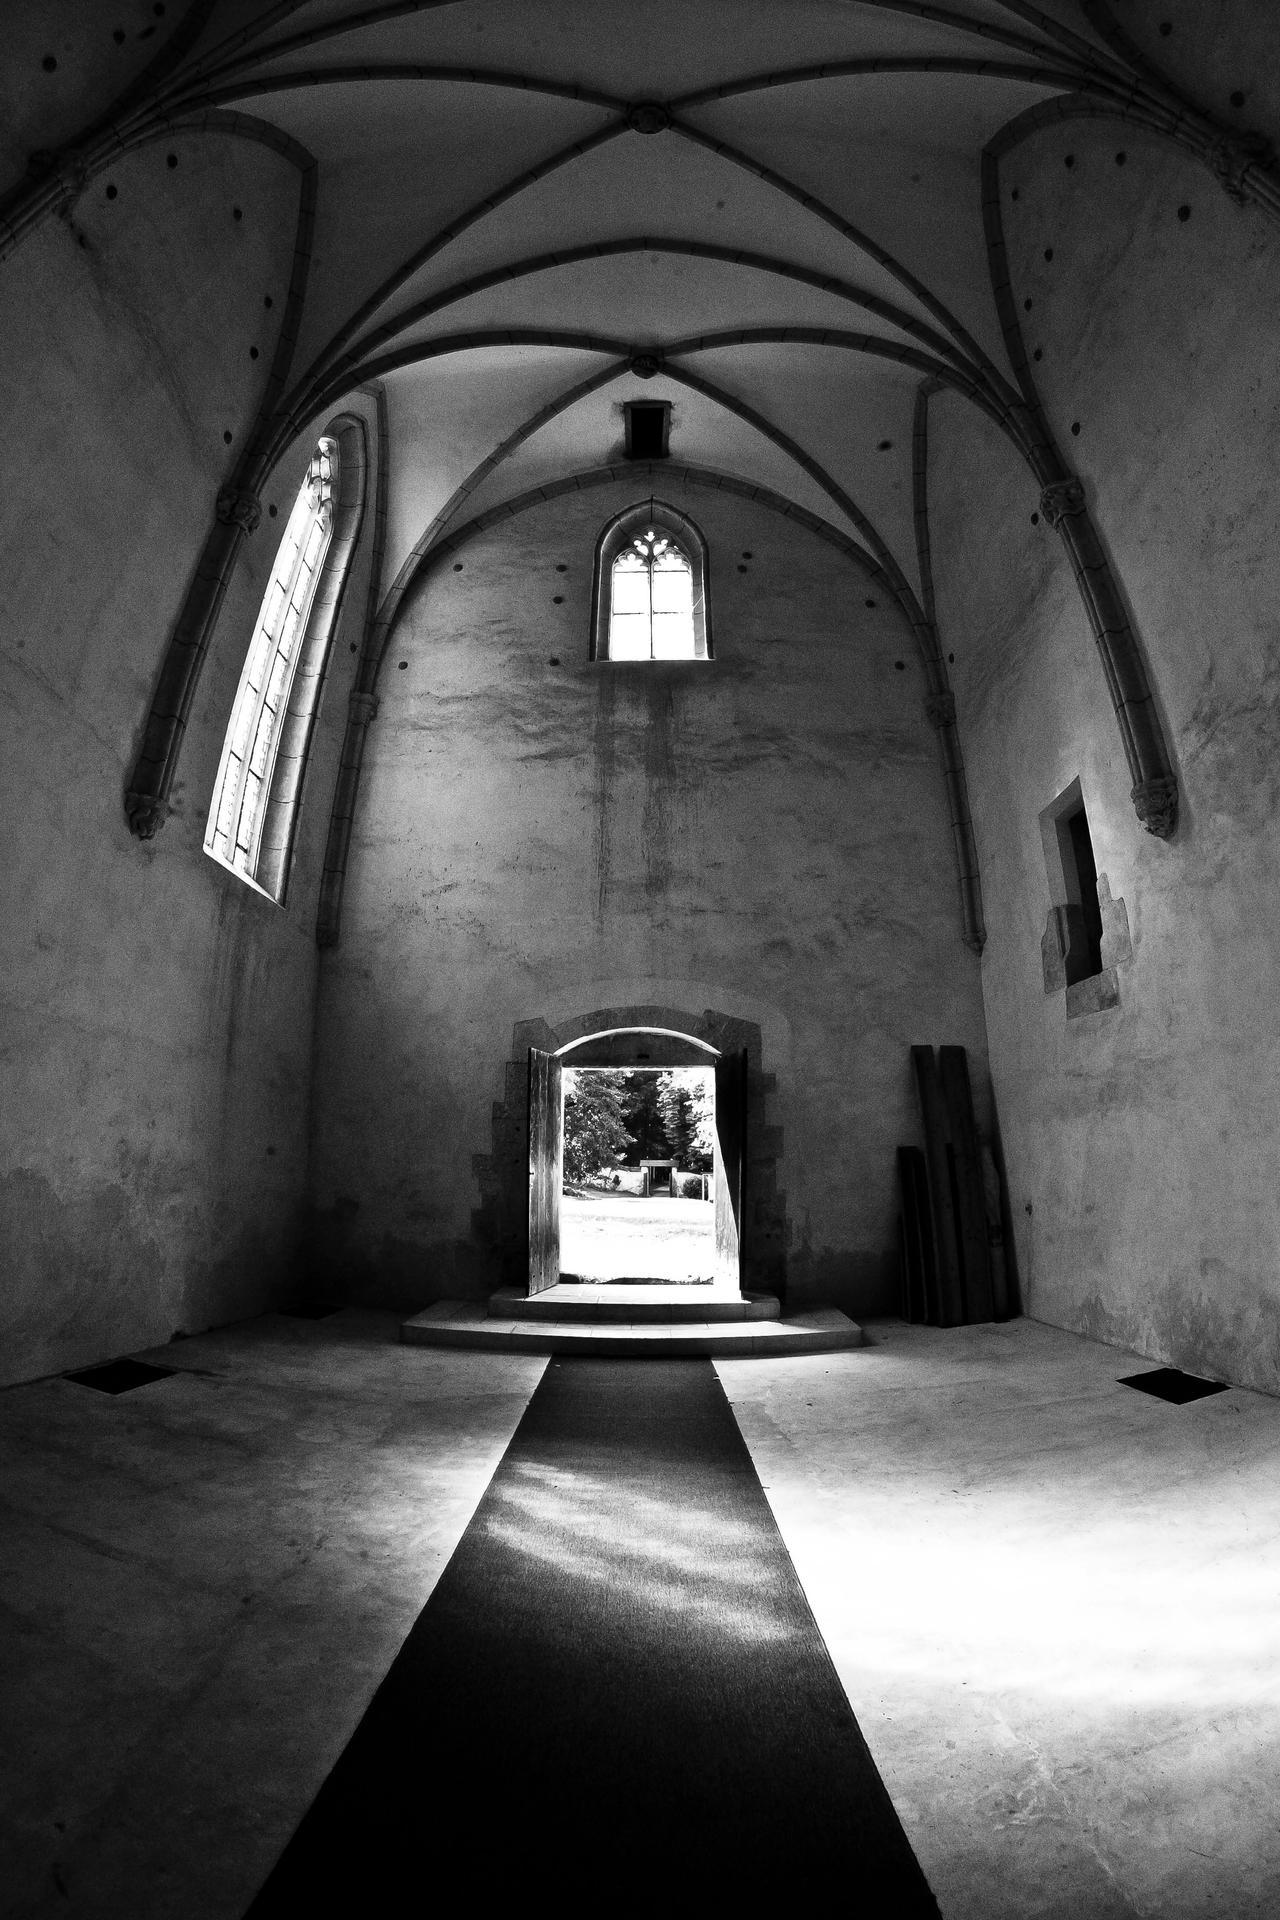 Gothic church interior by luka567